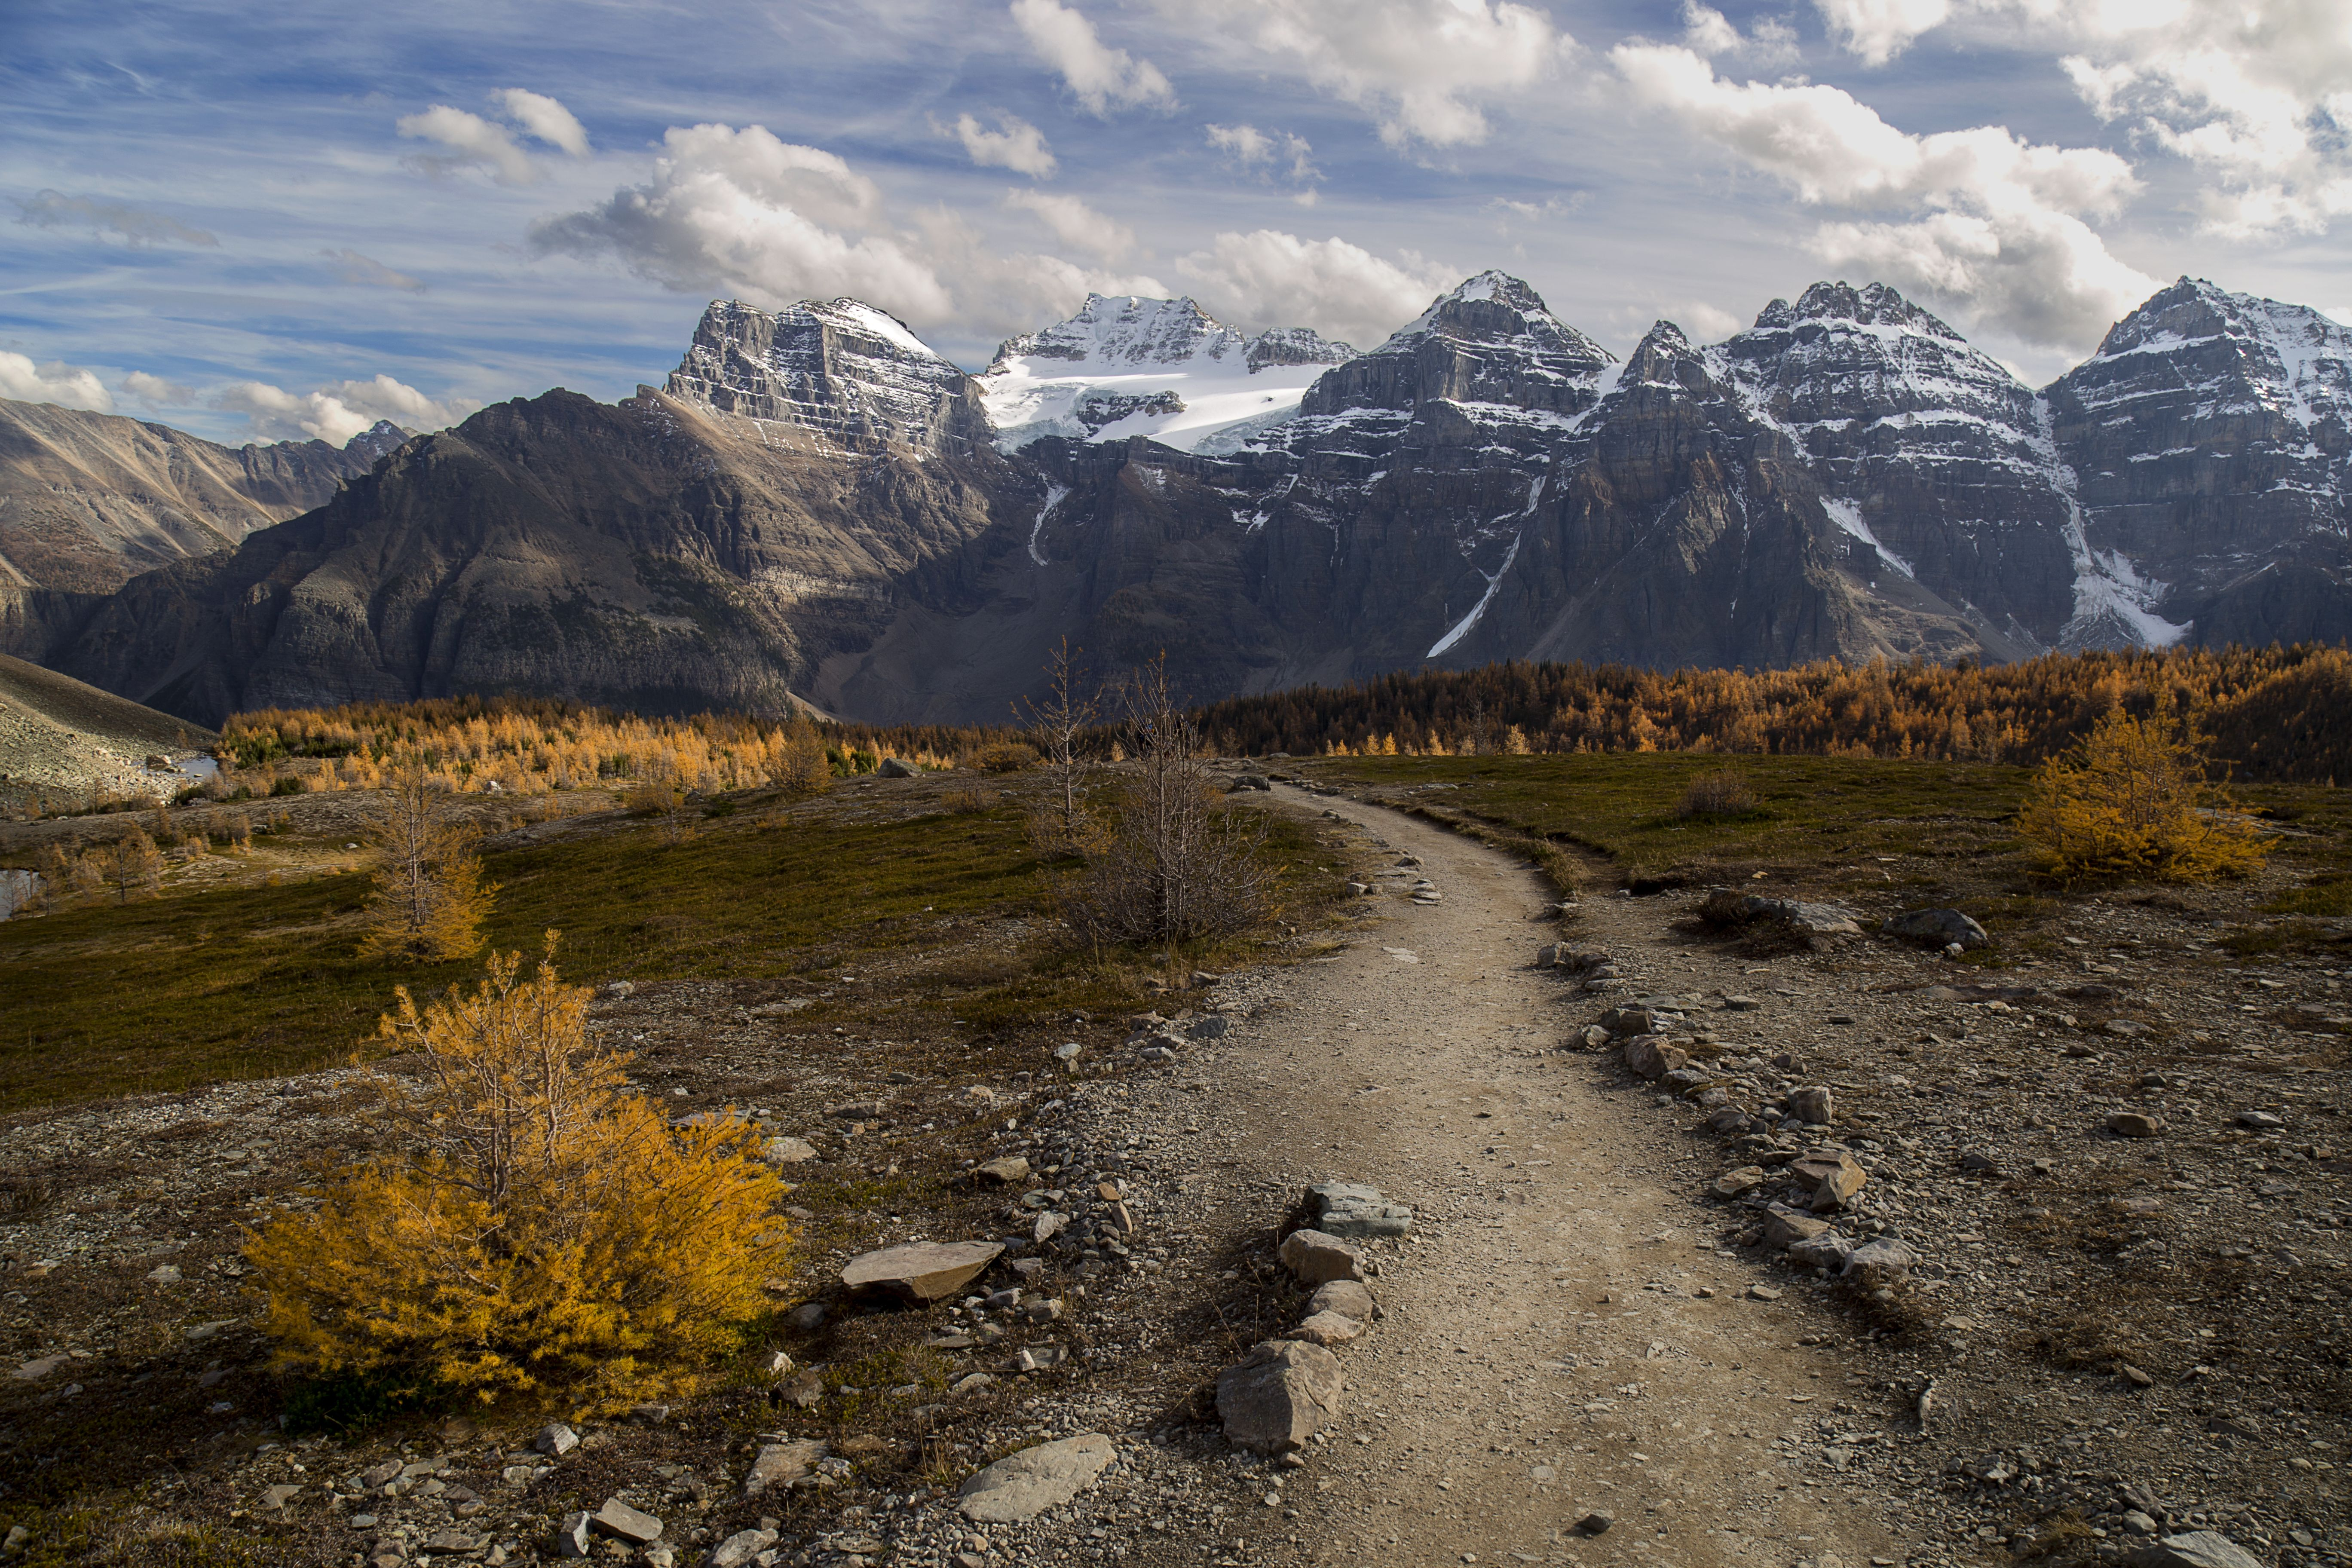 Larch valley trail banff national park oc reddit